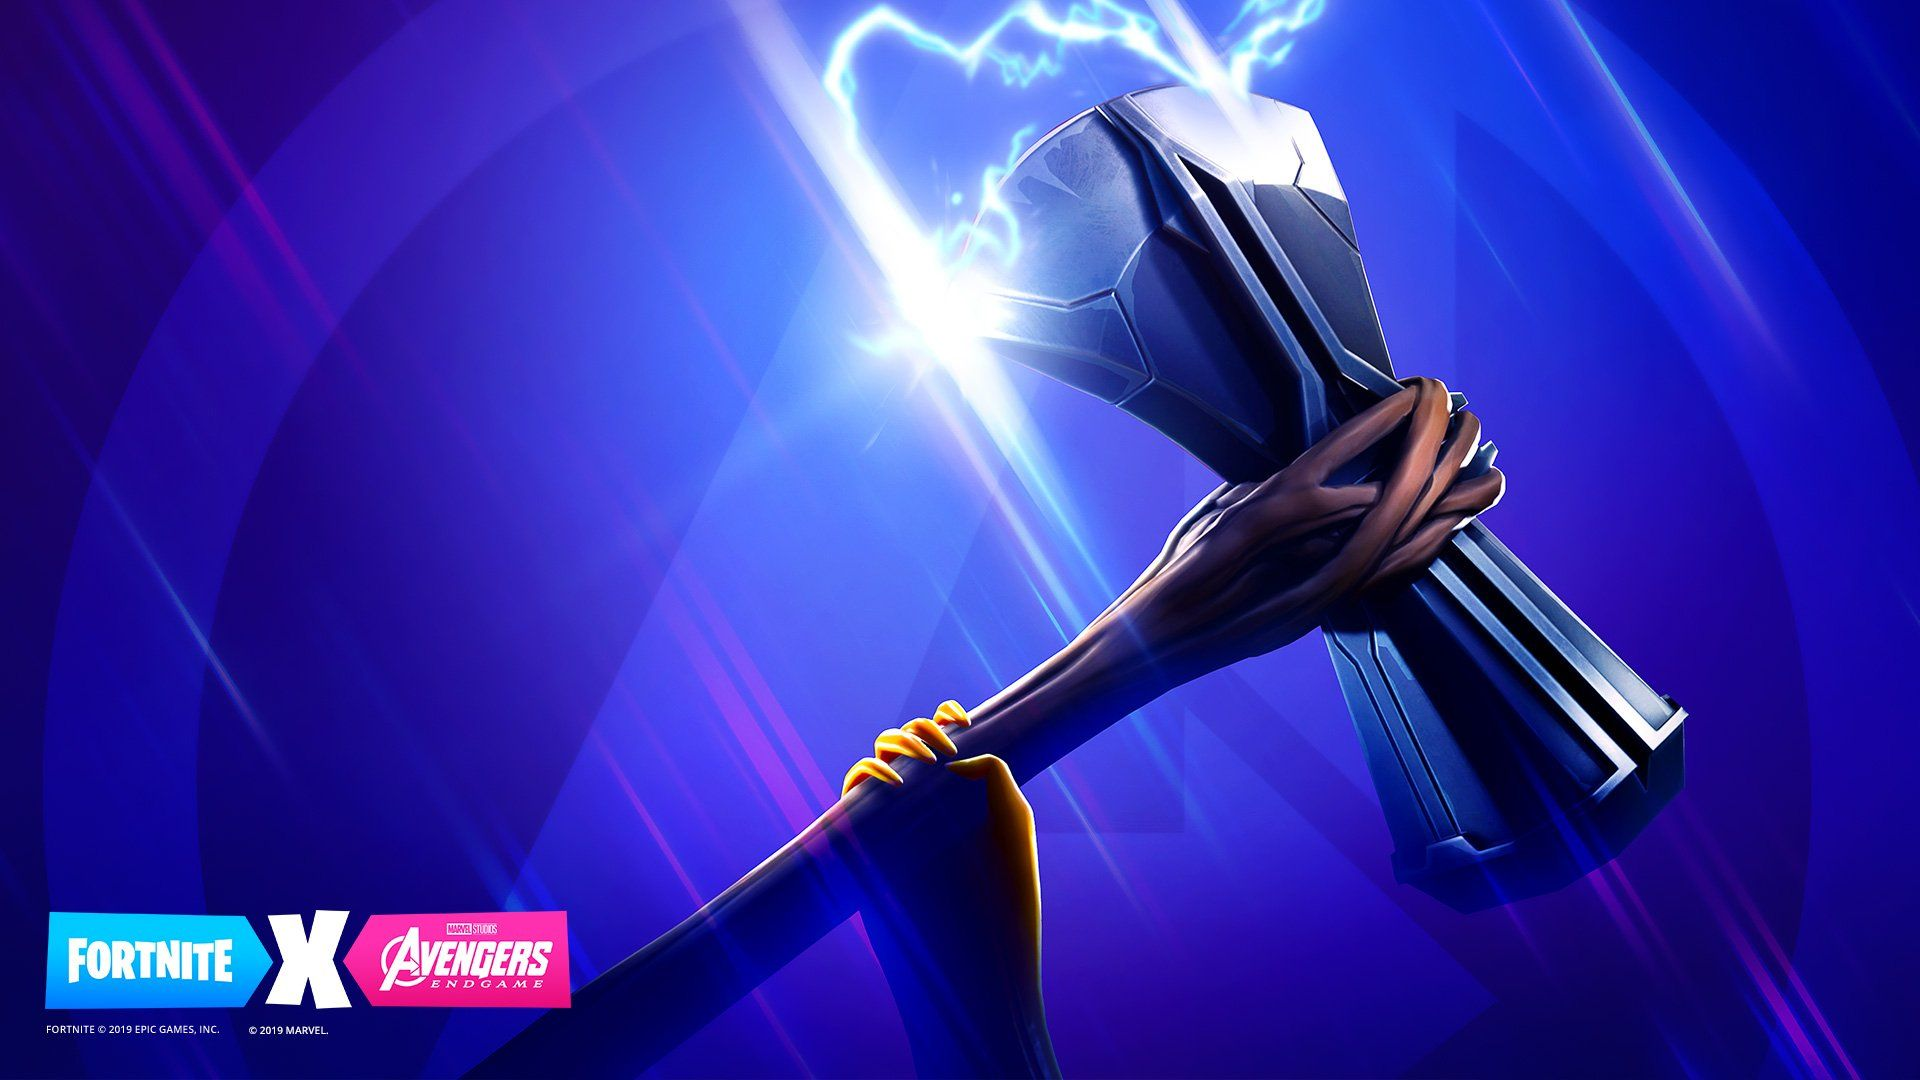 Fortnite X Avengers Whatever It Takes Teaser 2 Hints At Thor Hammer Skin